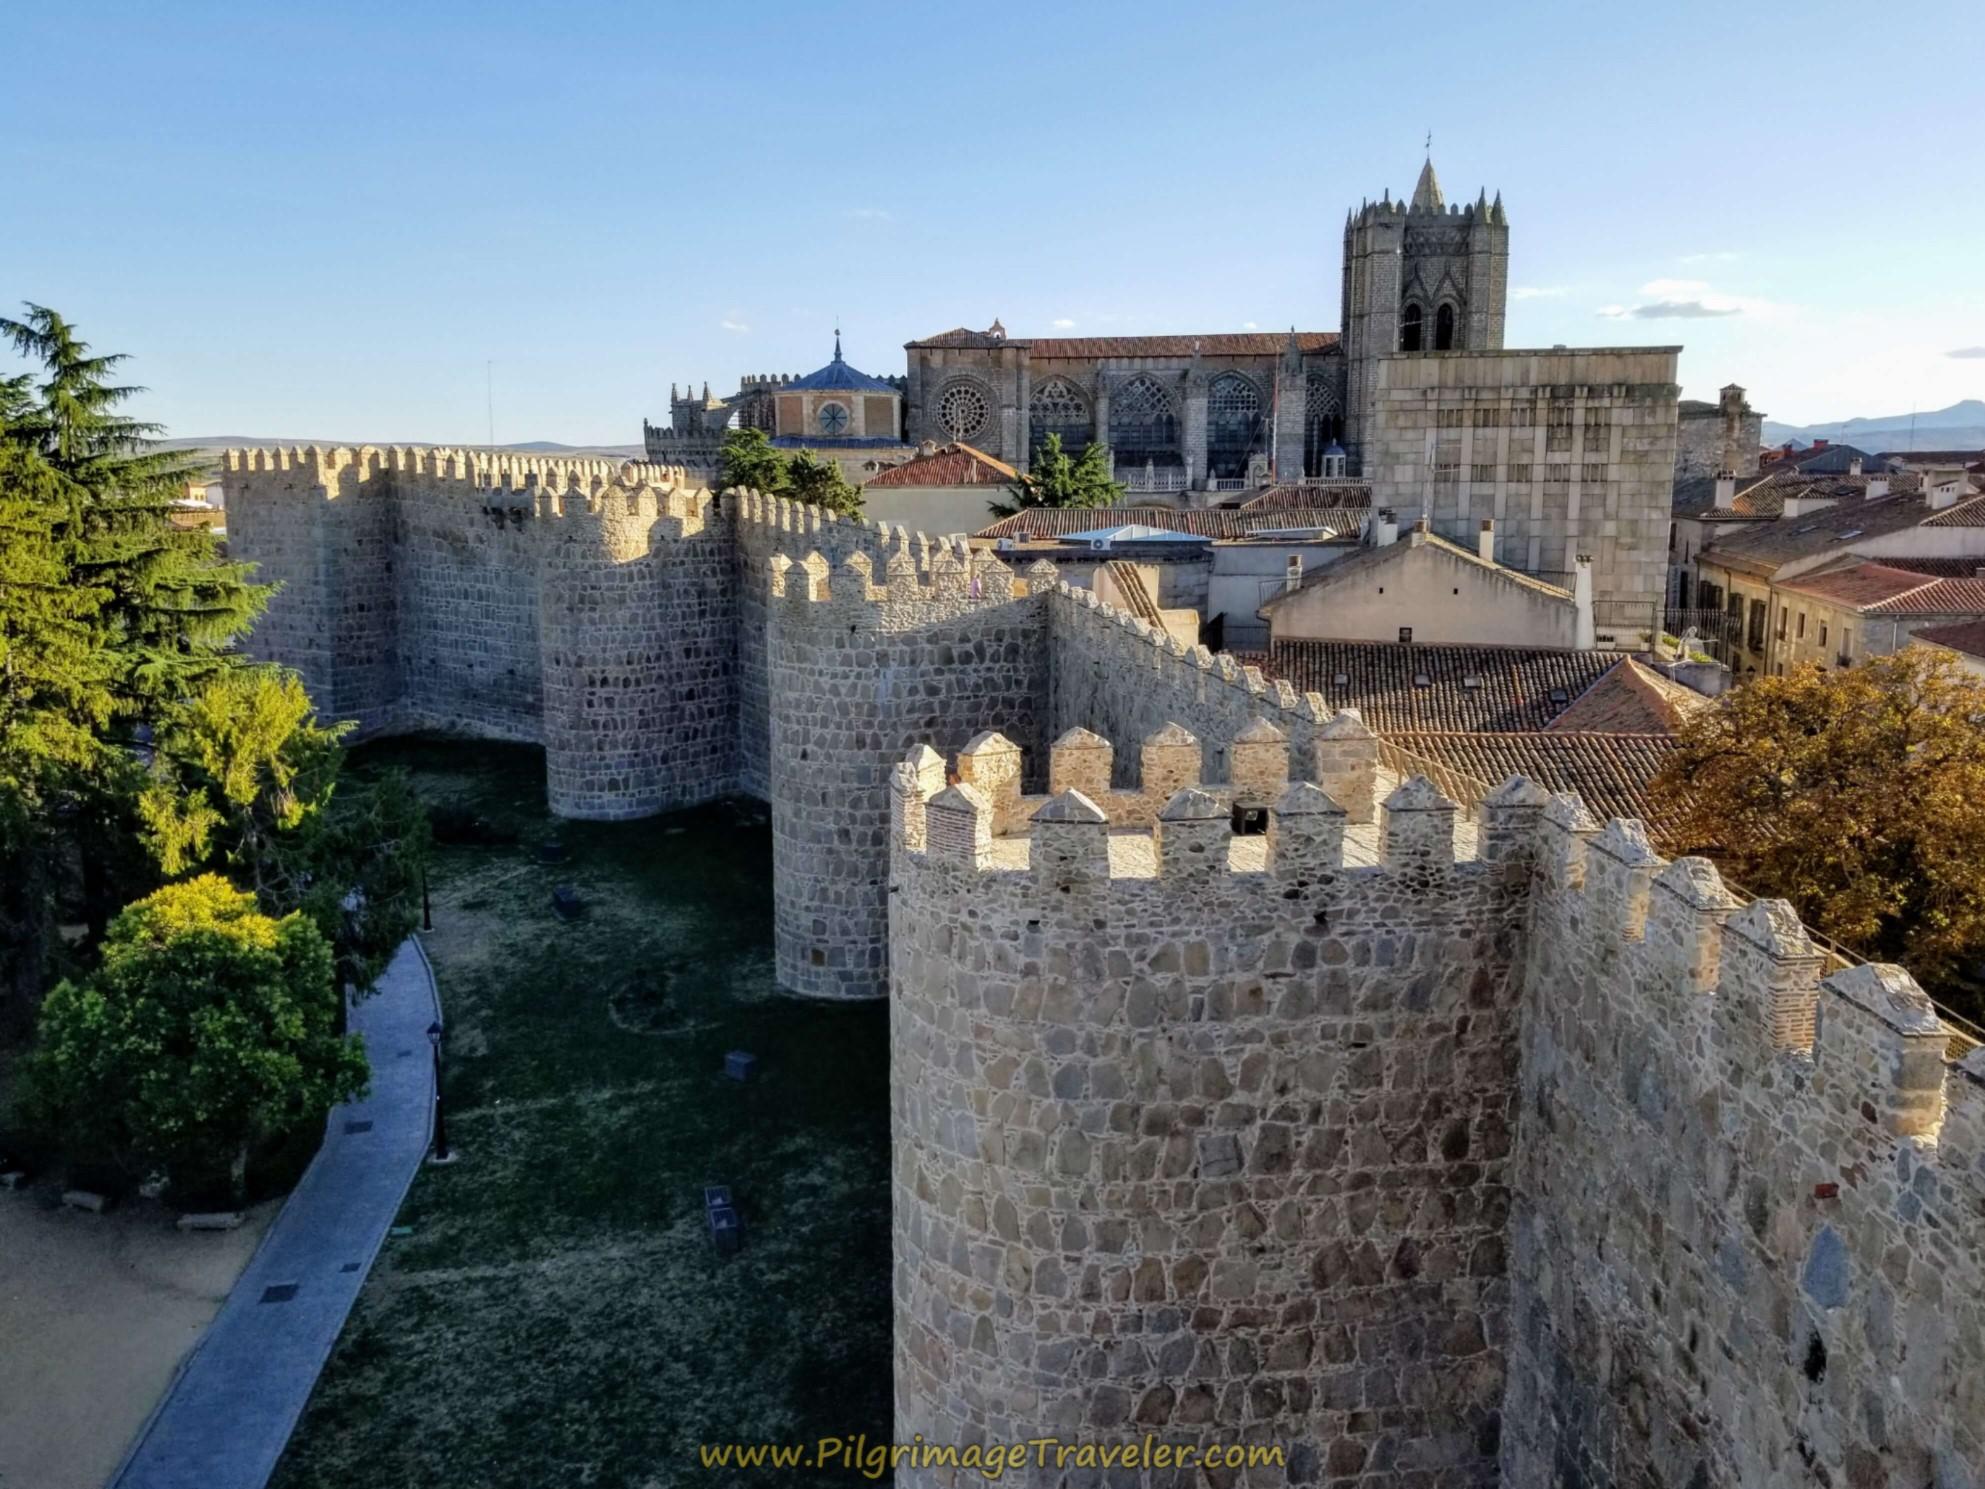 Pilgrimage to Ávila ~ The Start of the Camino Teresiano